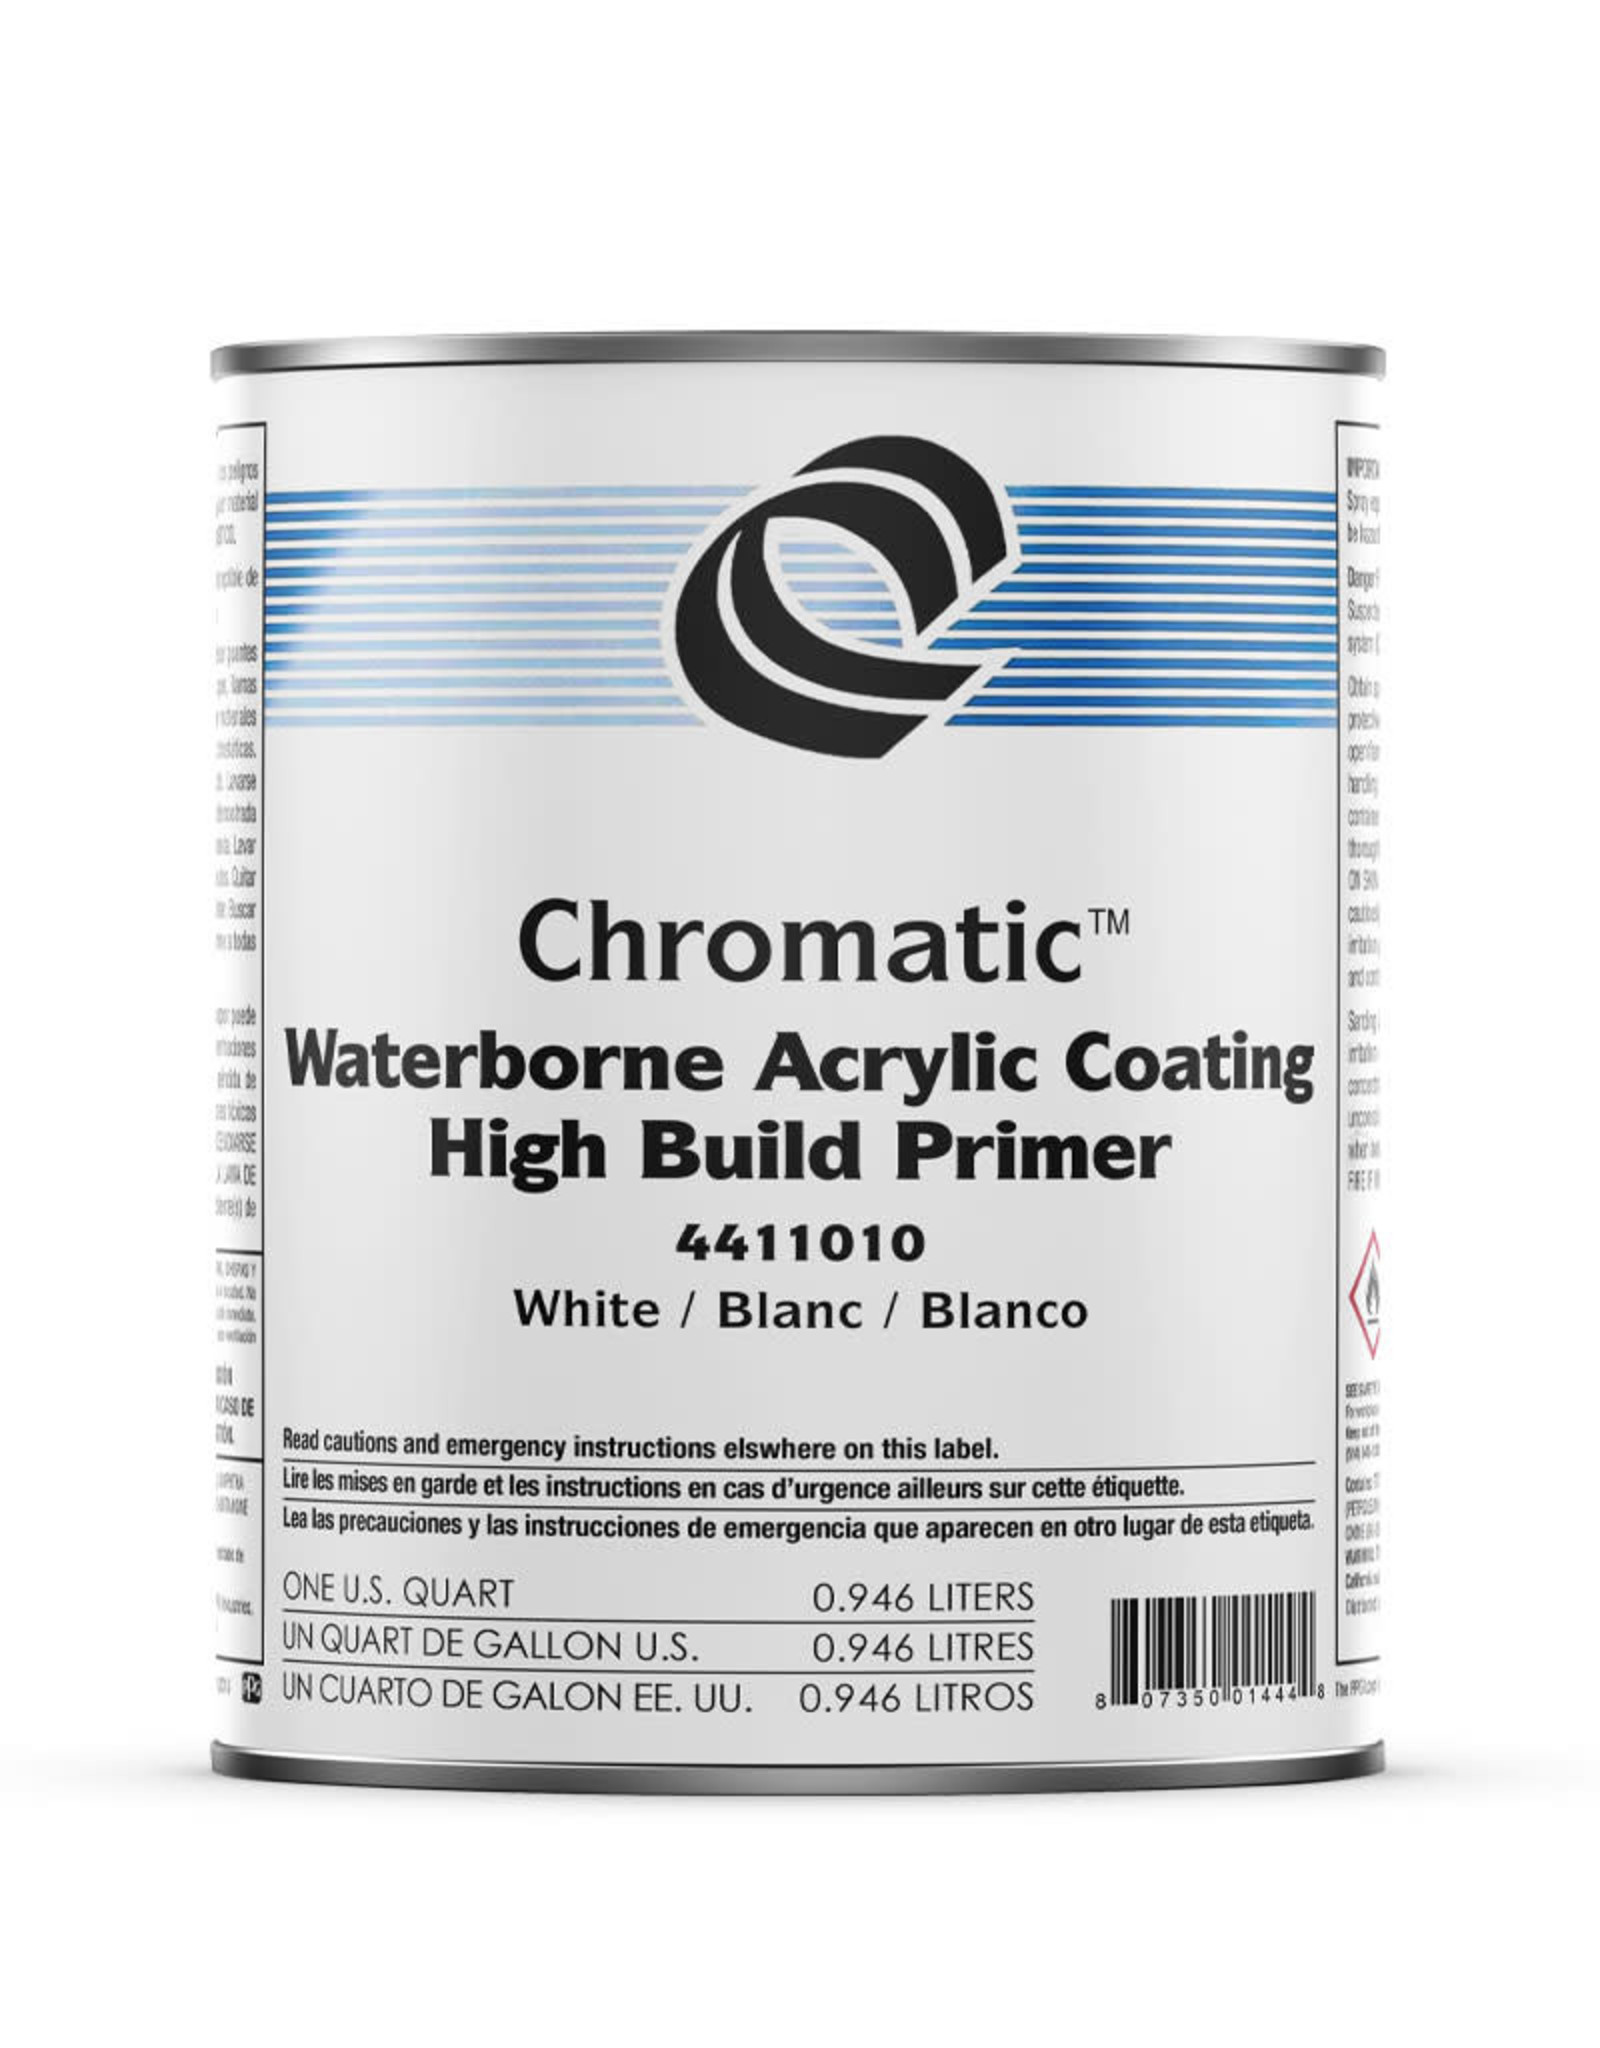 1 Shot 1 Shot Chromatic Waterborne Acrylic Coating High Build Primer 946 ml (White)